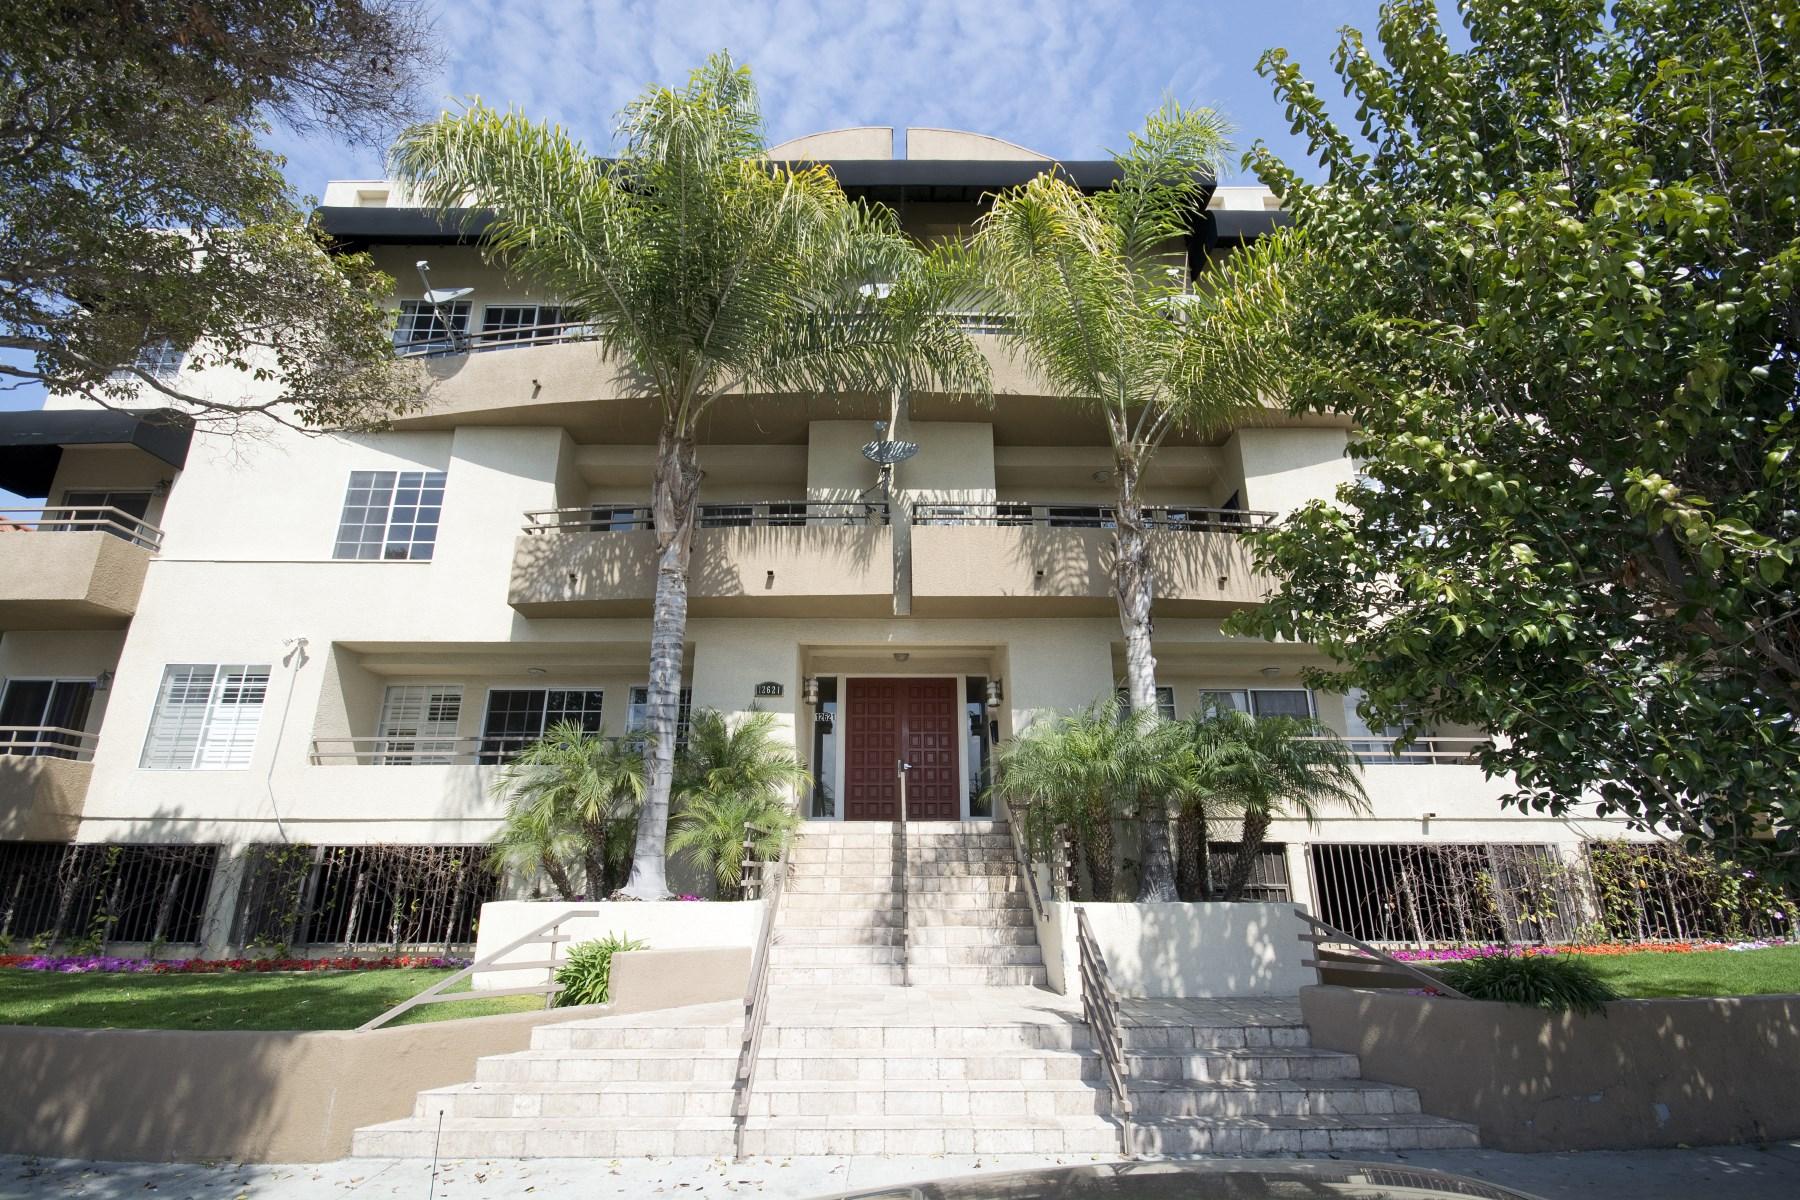 Condominium for Sale at Fantastic Mar Vista Luxury Condo 12621 Washington Place #202 Mar Vista, Los Angeles, California, 90066 United States